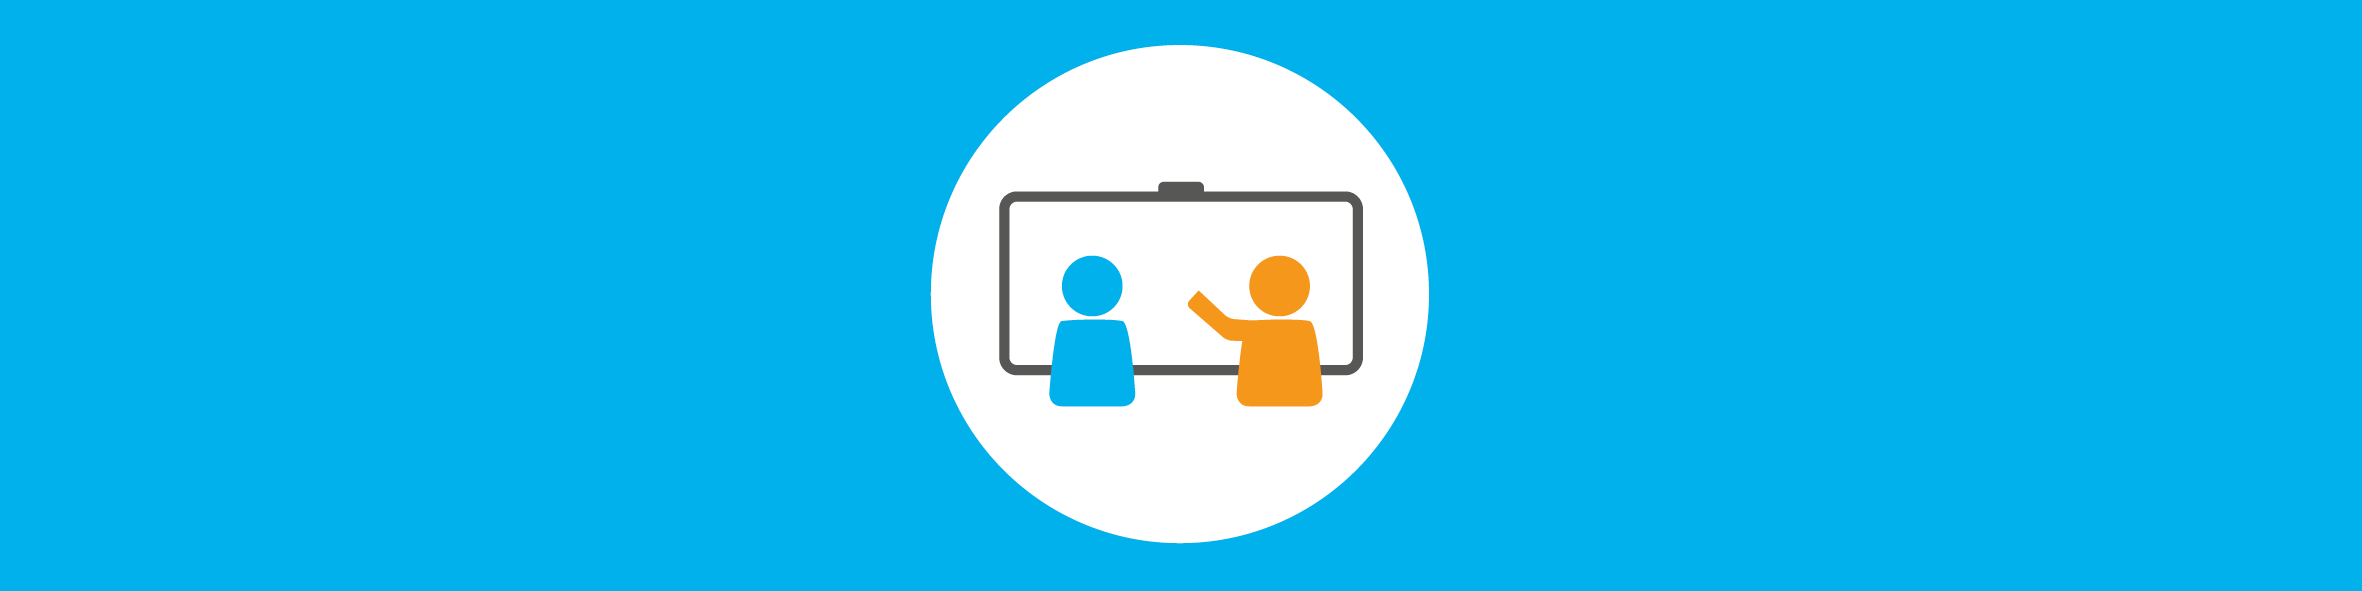 ICT, zo krijg je je team mee - Cloudwise Academy header trainingsaanbod